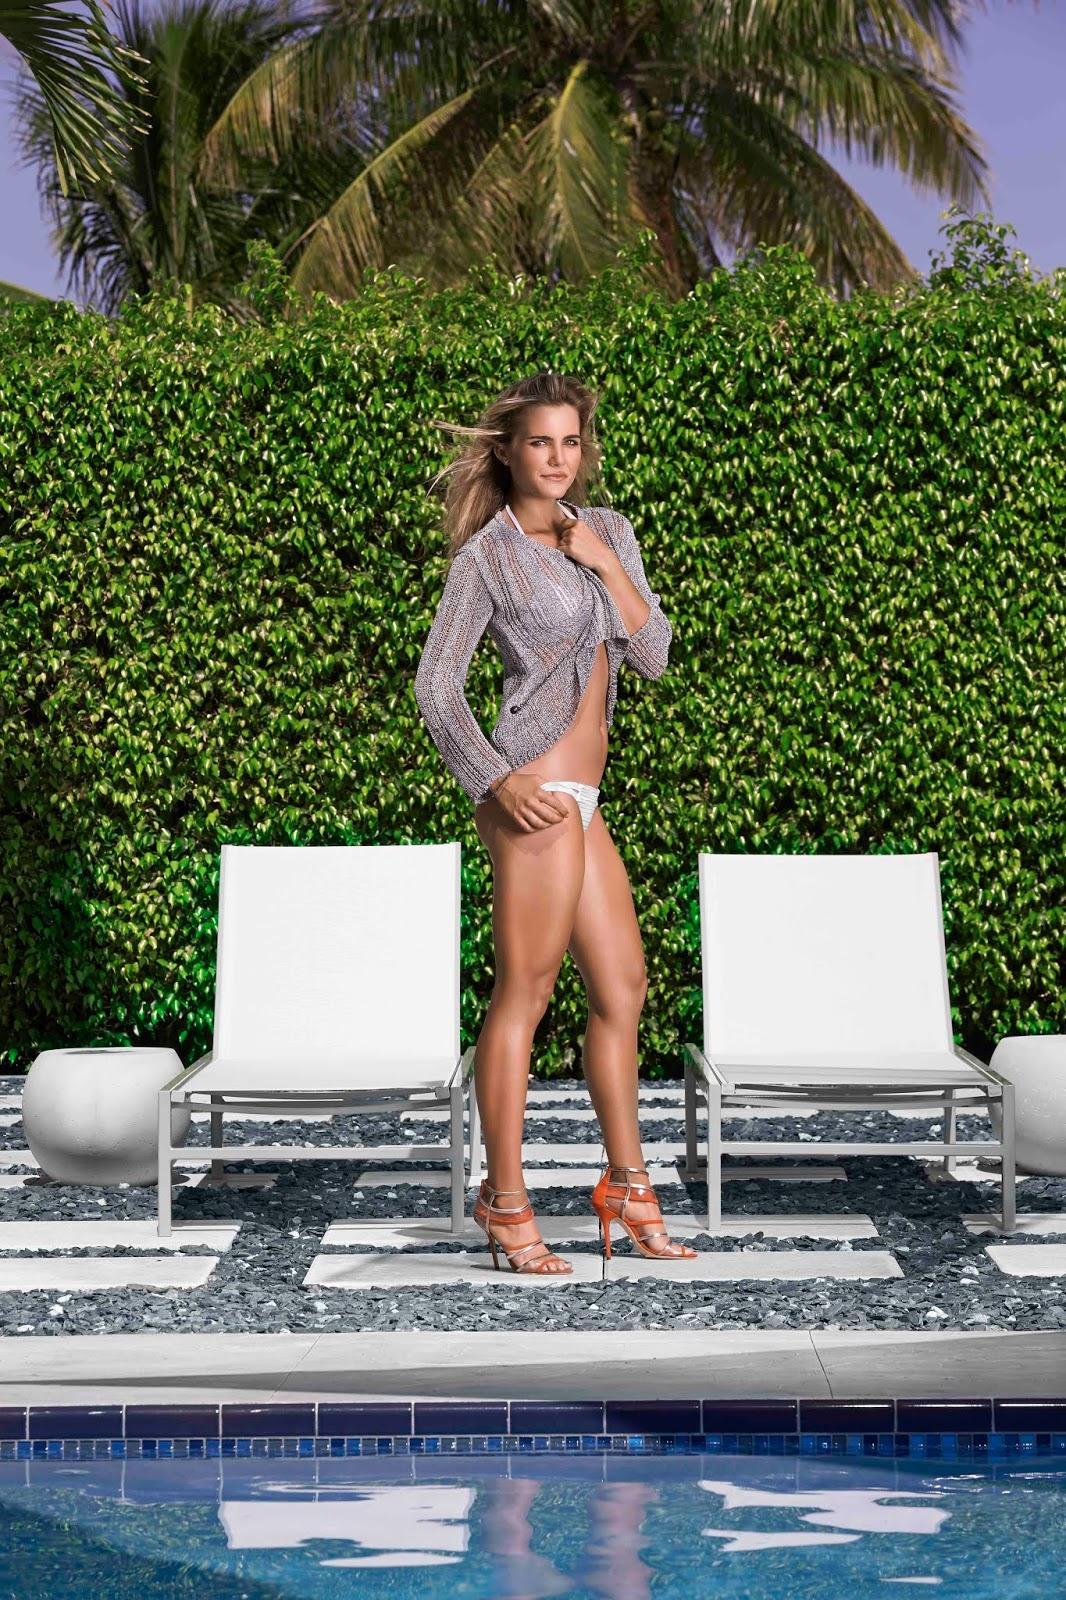 Sports Hotties Hottest Bikini Photos Of Sexy Lpga Golfer -7271